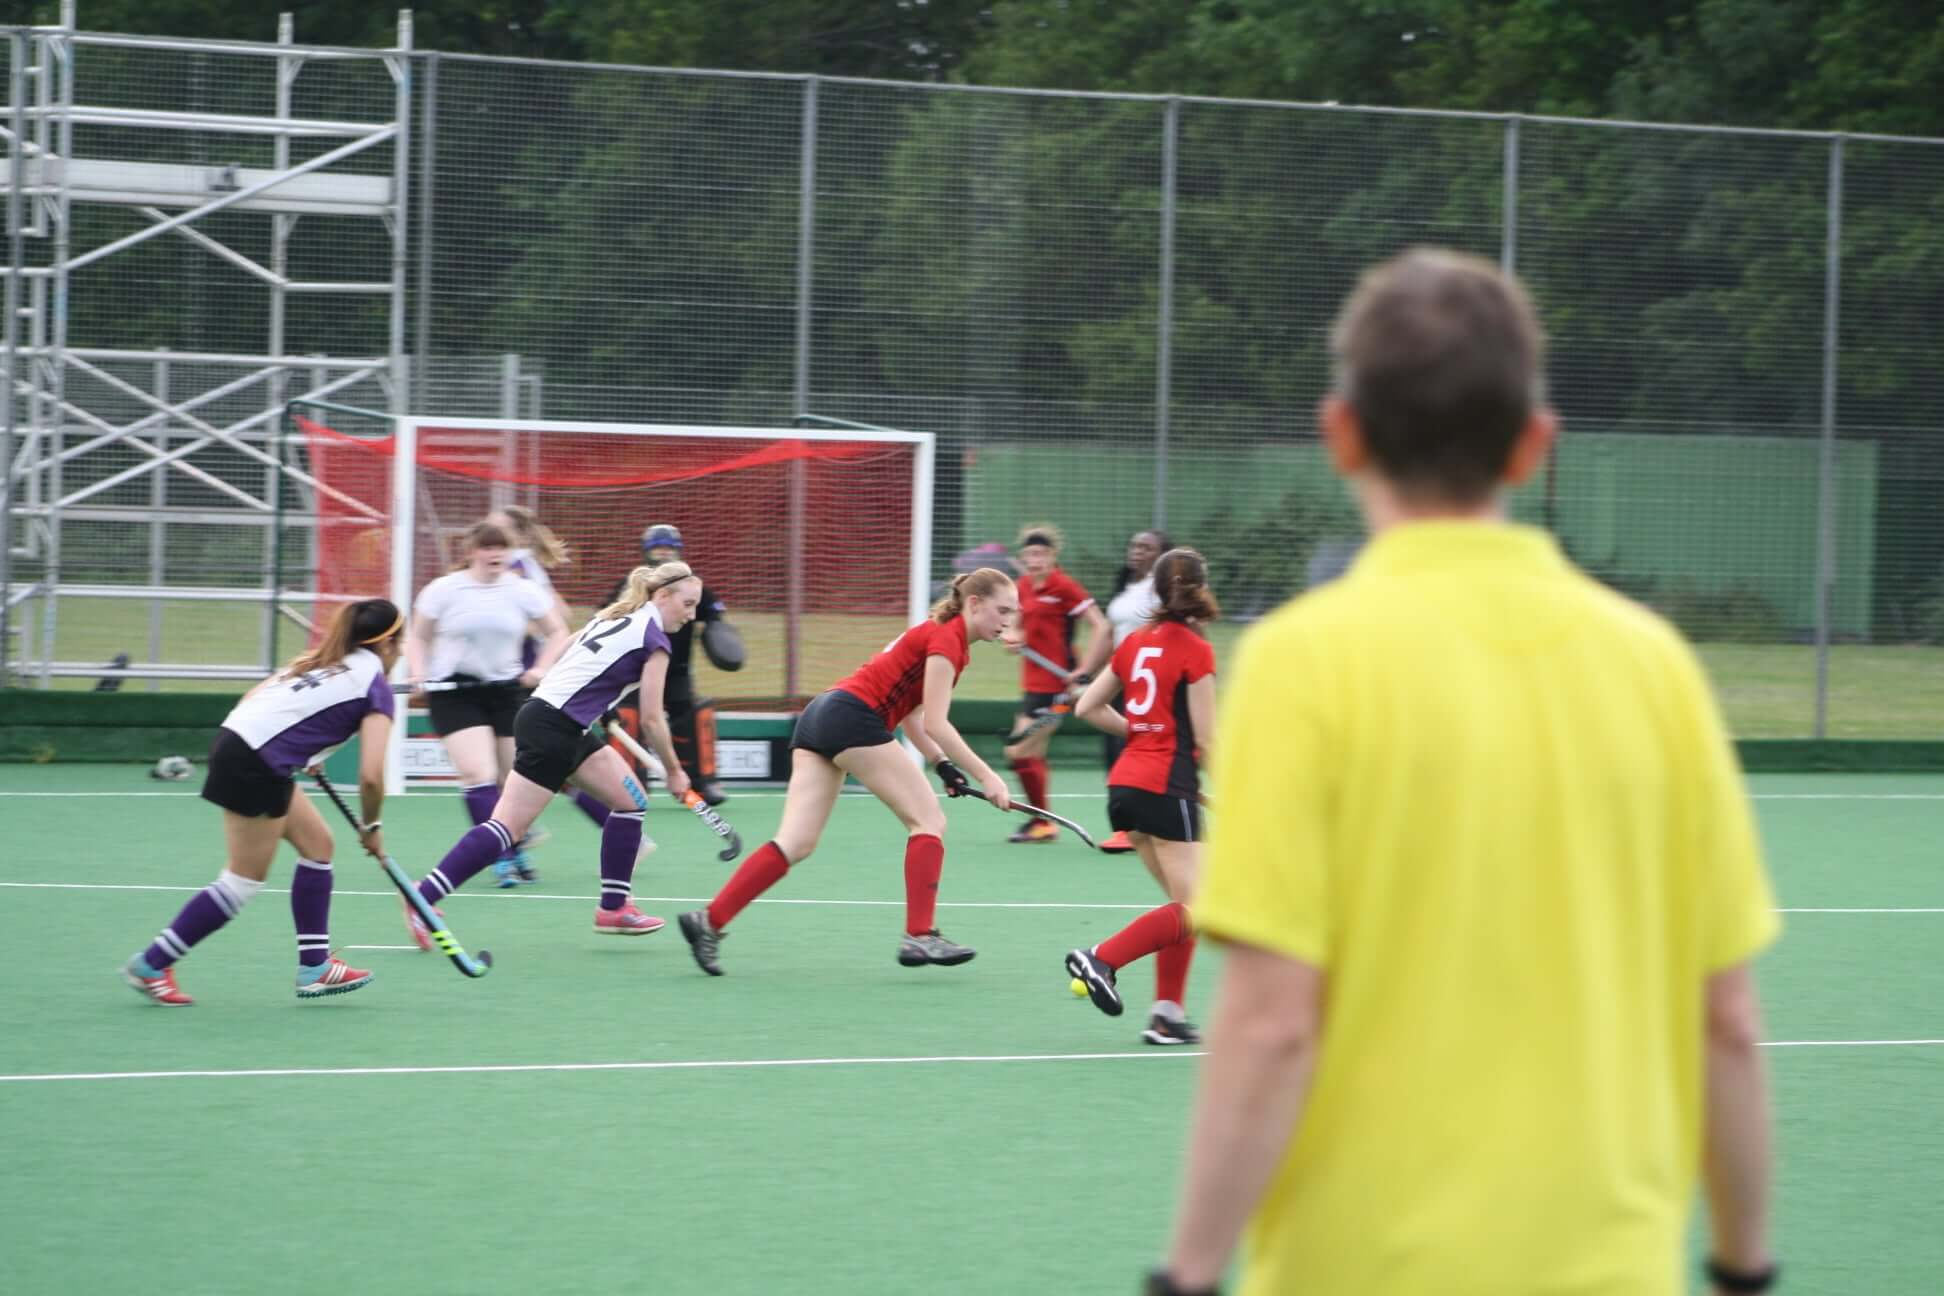 Ladies' Summer League round-up